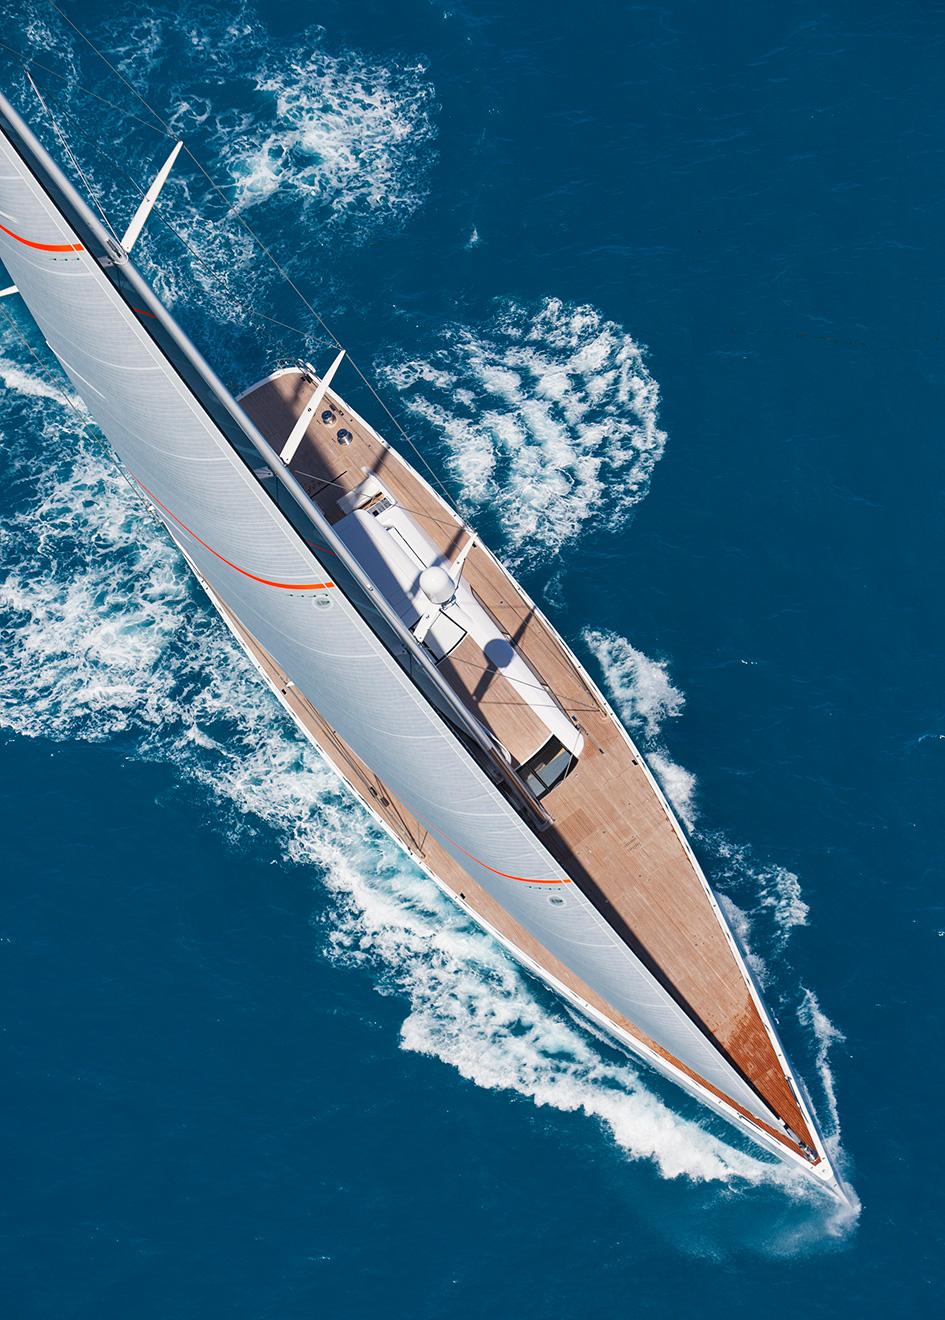 running-shot-of-vitters-sailing-super-yacht-unfurled